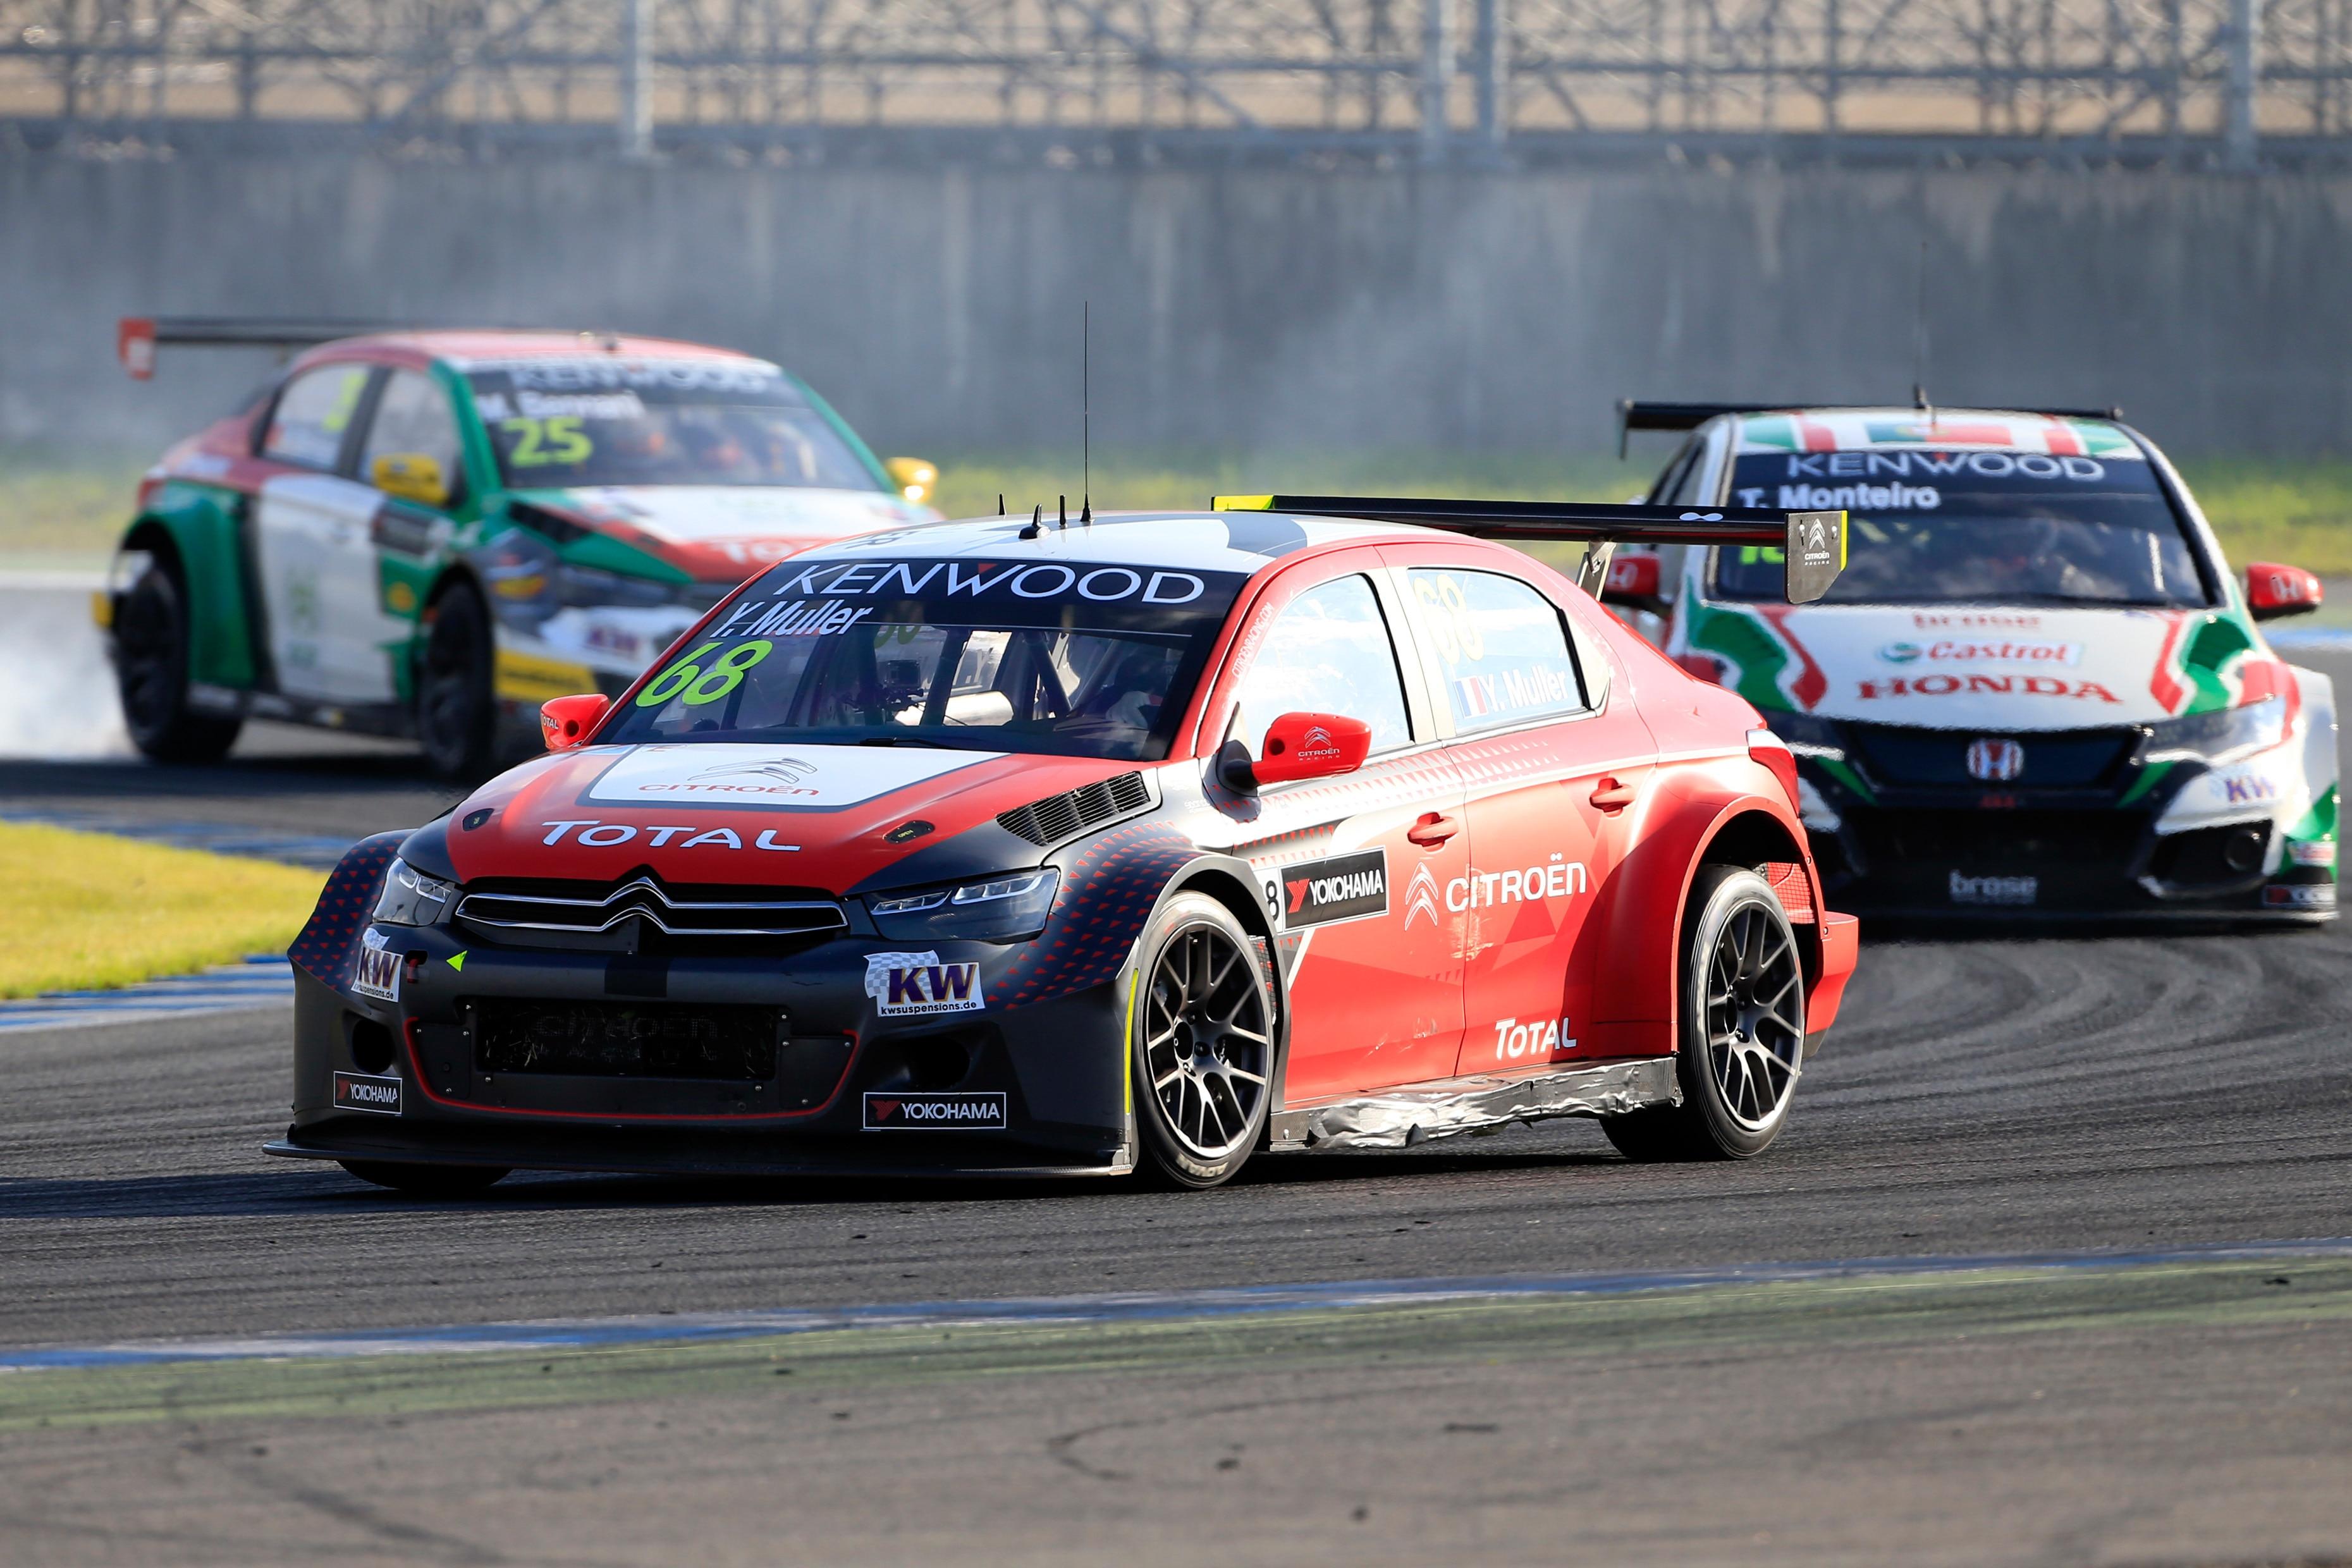 FIA WORLD TOURING CAR CHAMPIONSHIP 2016 - JAPAN - MOTEGI - WTCC - 01/09/2016 TO 04/09/2016 - PHOTO :  @World 68- YVAN MULLER - CITROEN TOTAL WTCC